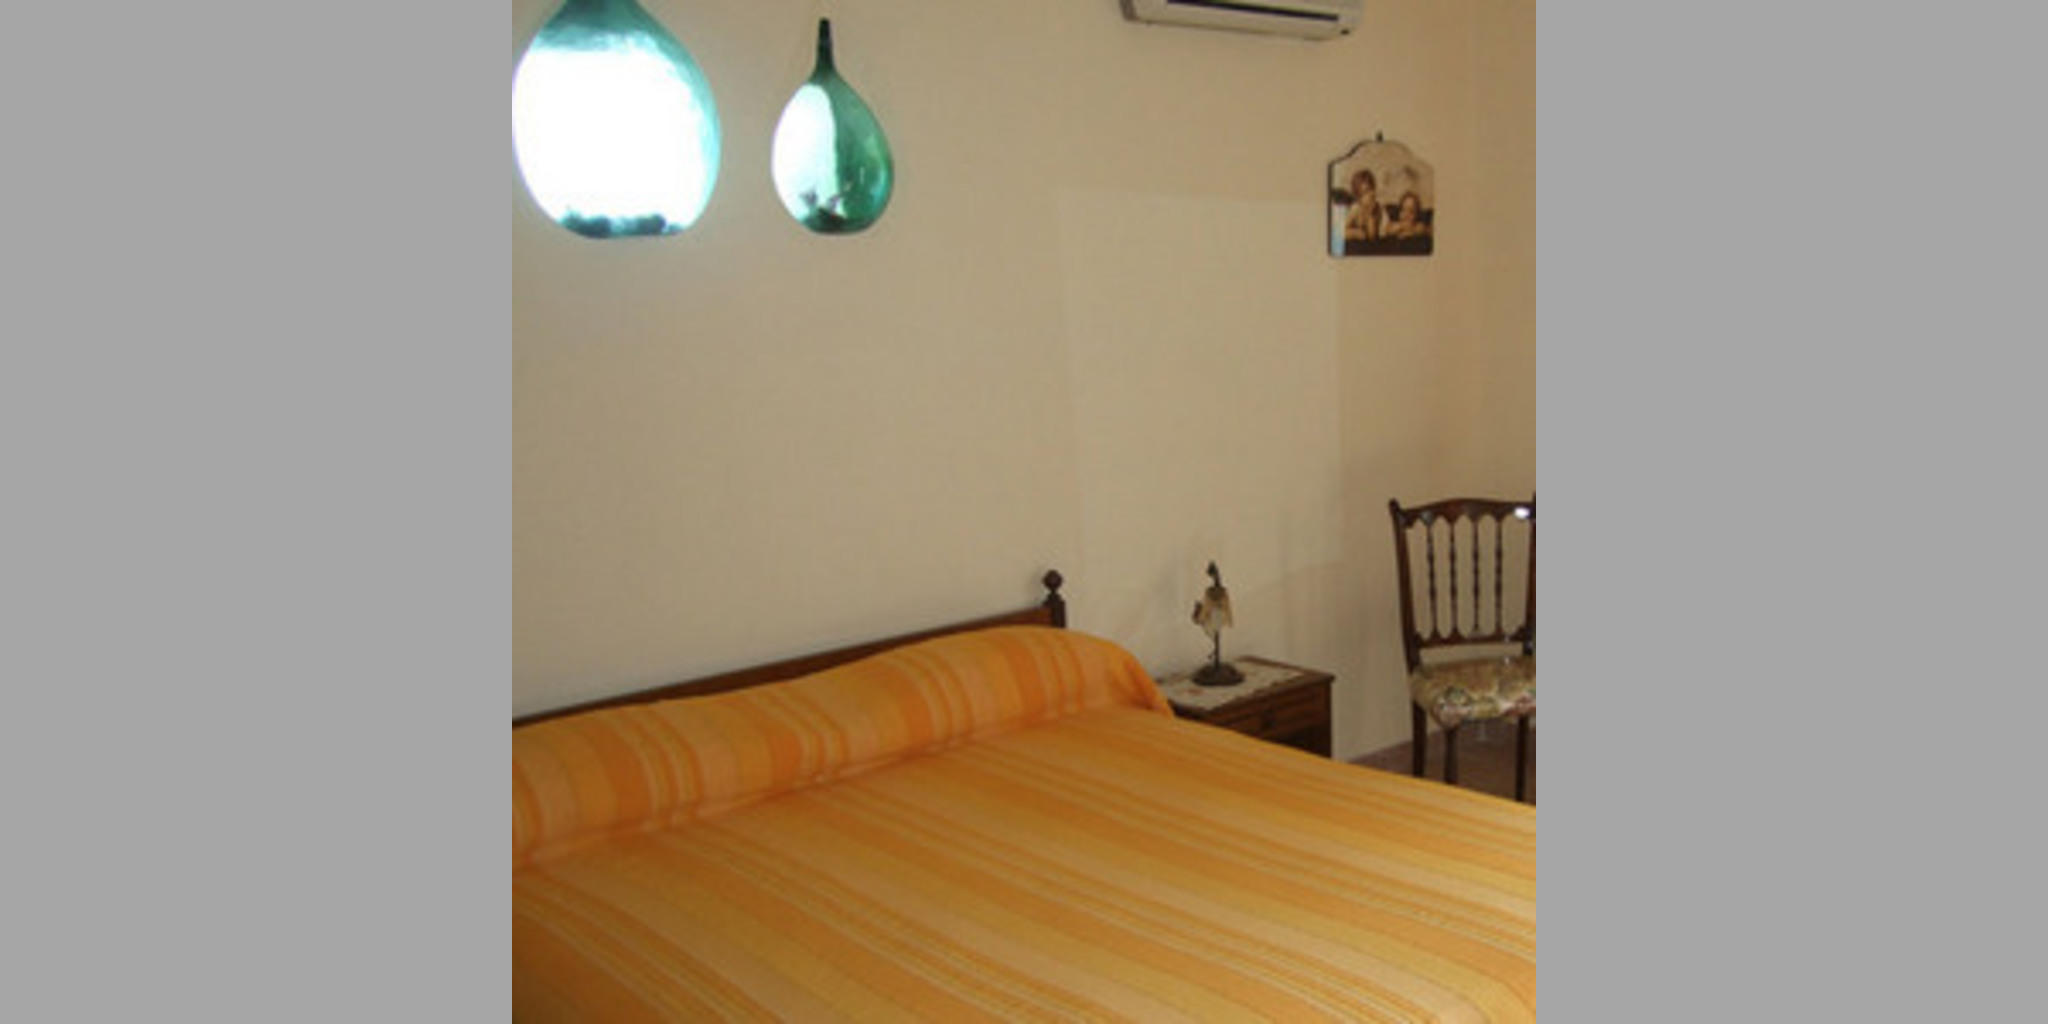 Bed & Breakfast Calatabiano - Calatabiano